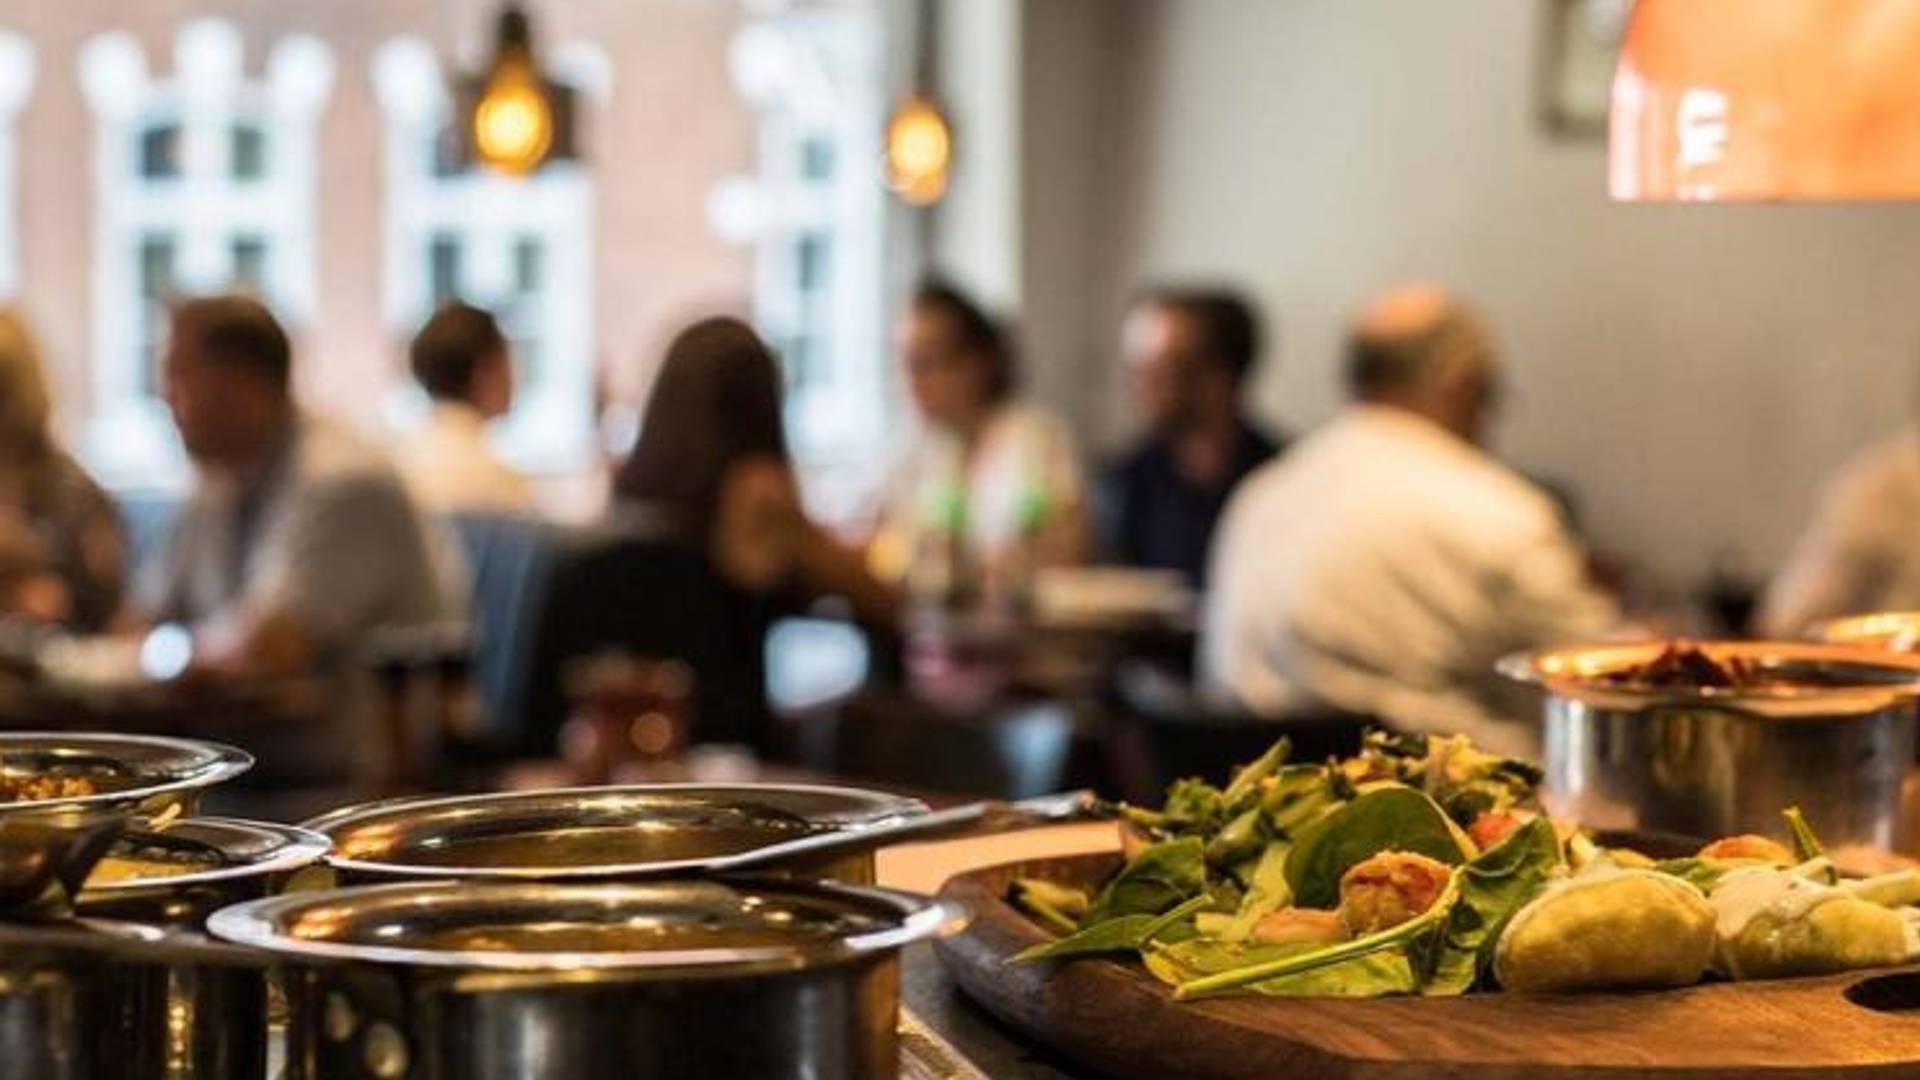 kerala opens dining in